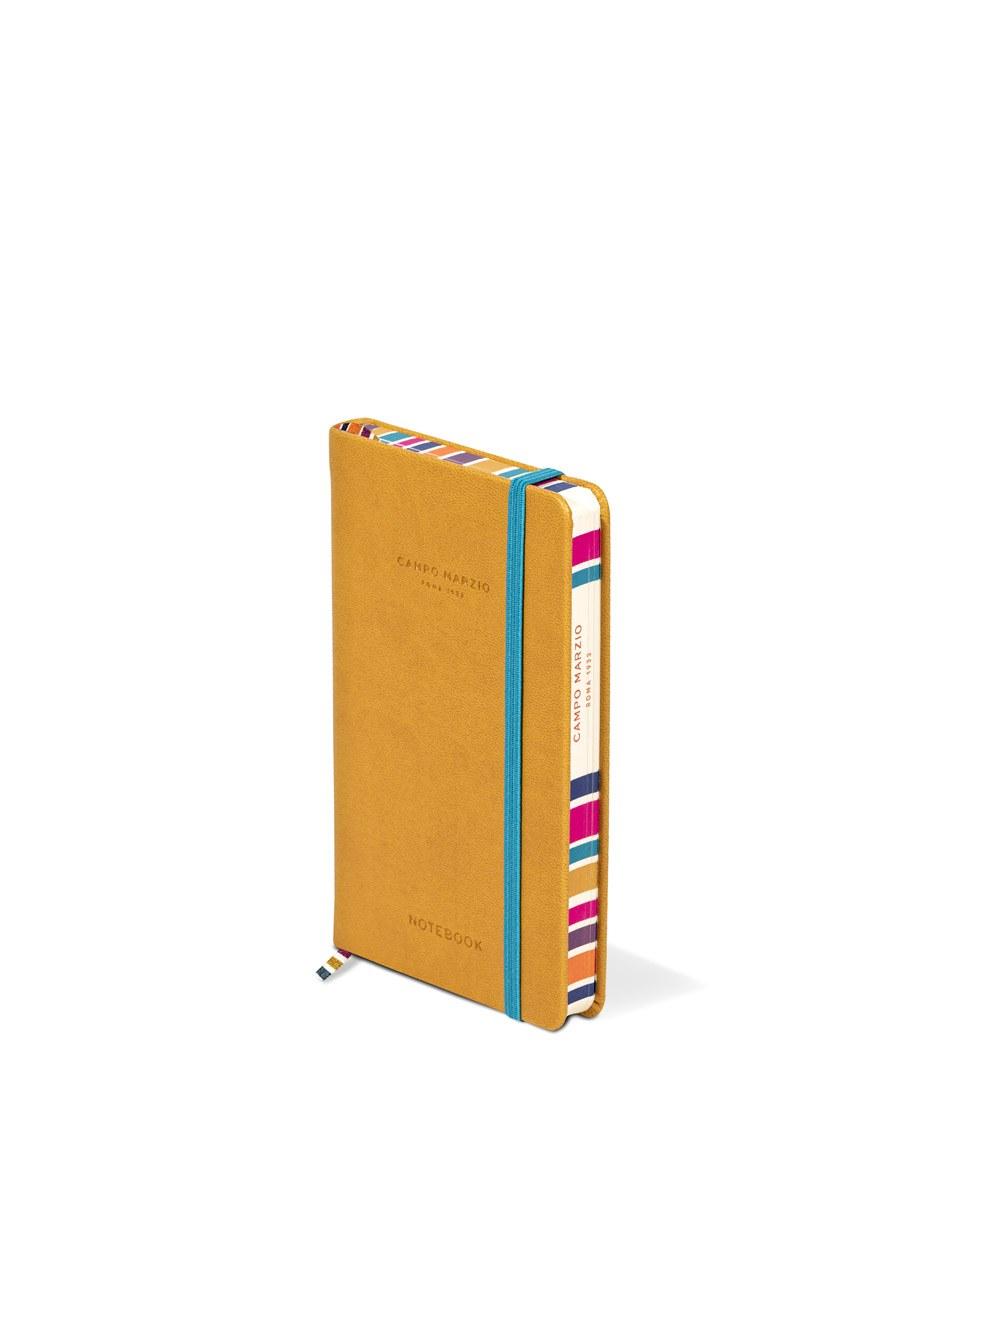 Notes 9x14 Multicolor Edge - Golden Yellow